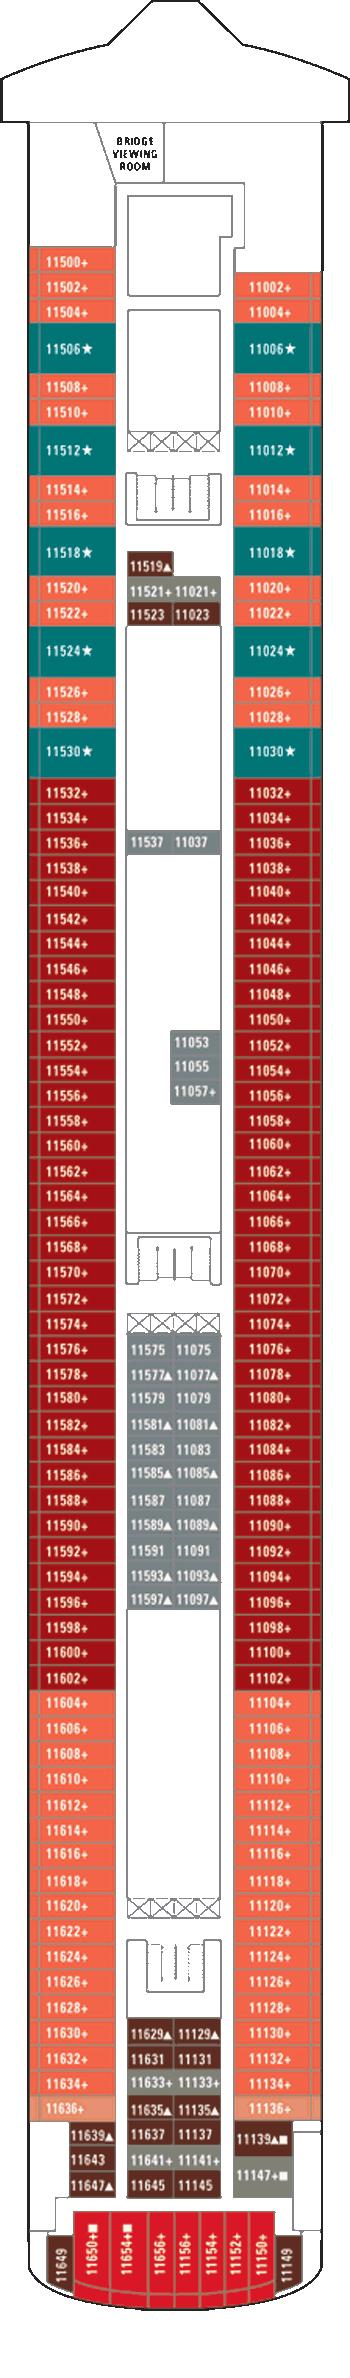 Norwegian Gem - Deck 11